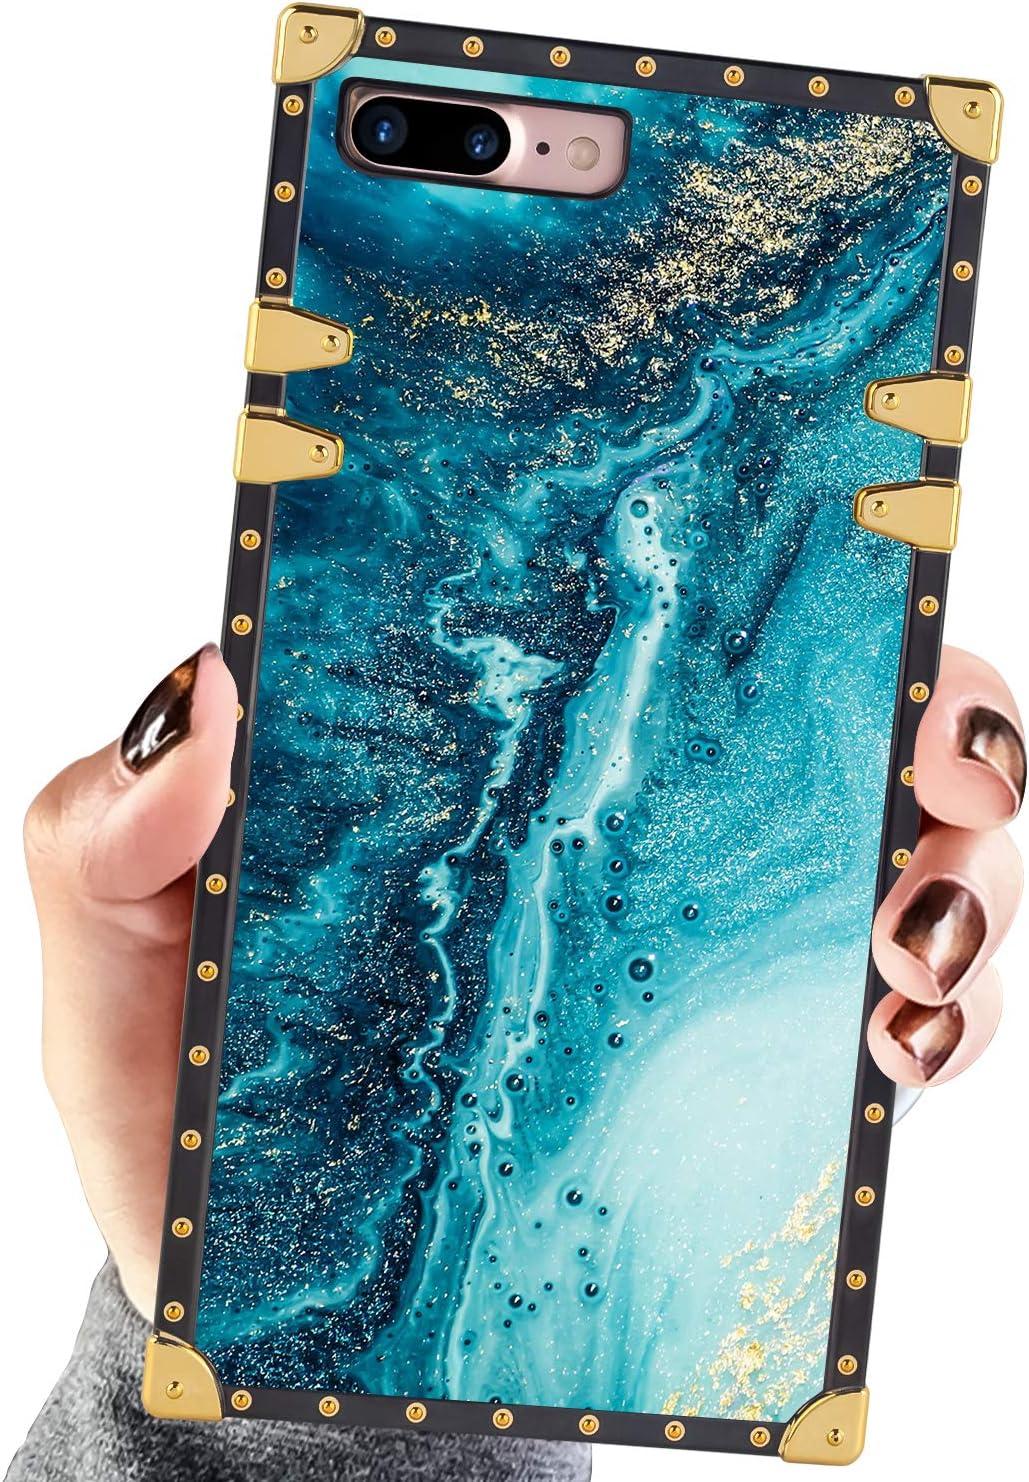 Square Case Compatible iPhone 7 Plus iPhone 8 Plus Case Blue Gold Marble Luxury Elegant Soft Shock Protection Case Cover Compatible iPhone 7 Plus/8 Plus 5.5 Inch